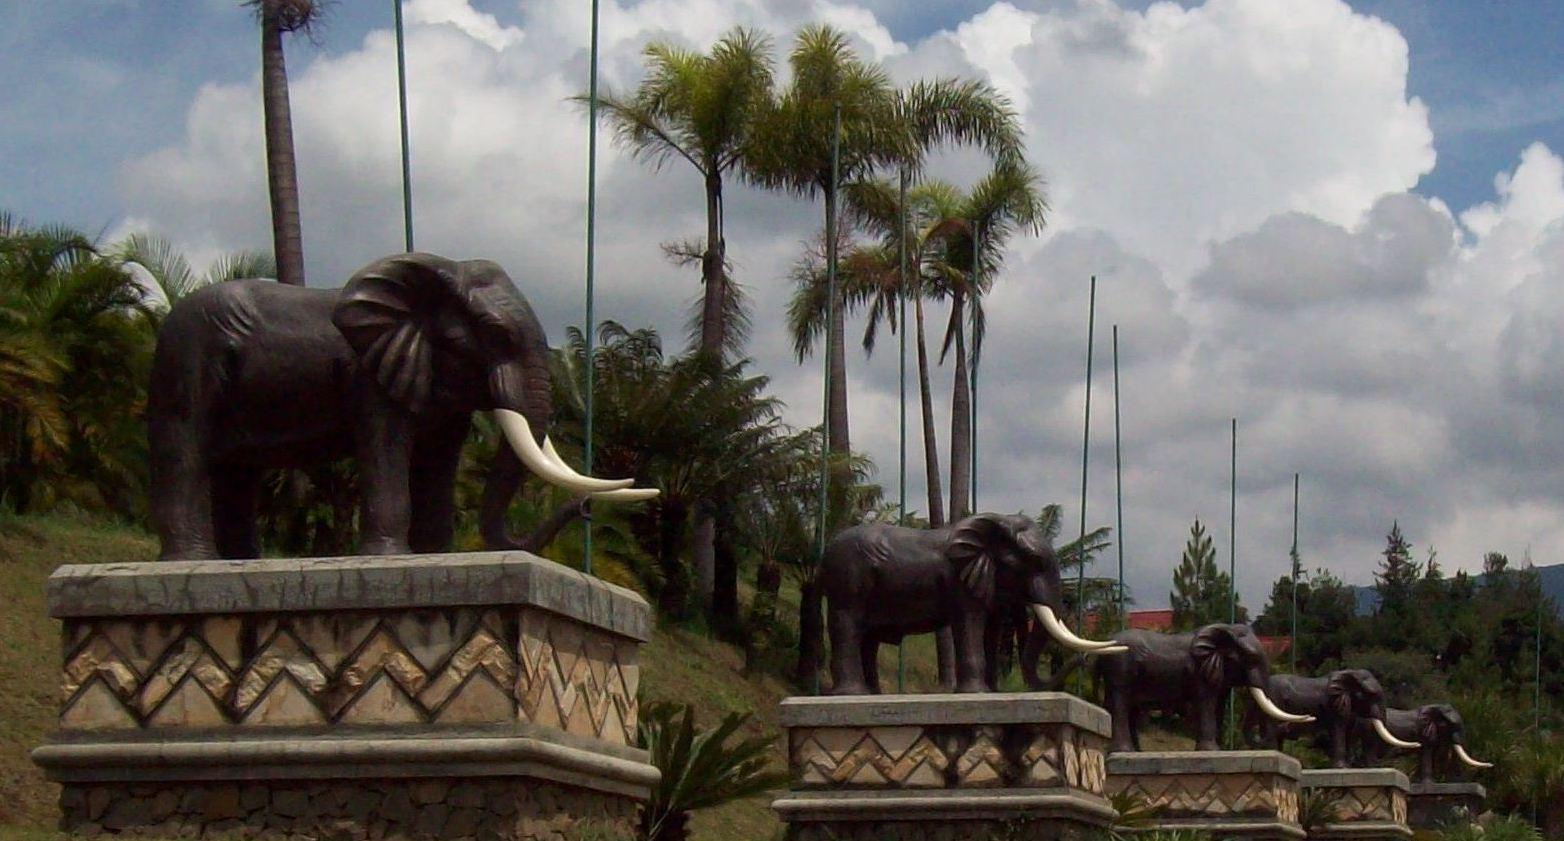 Wisata Bandung Kampung Gajah Aneka Tempat Patung Taman Lampung Kota